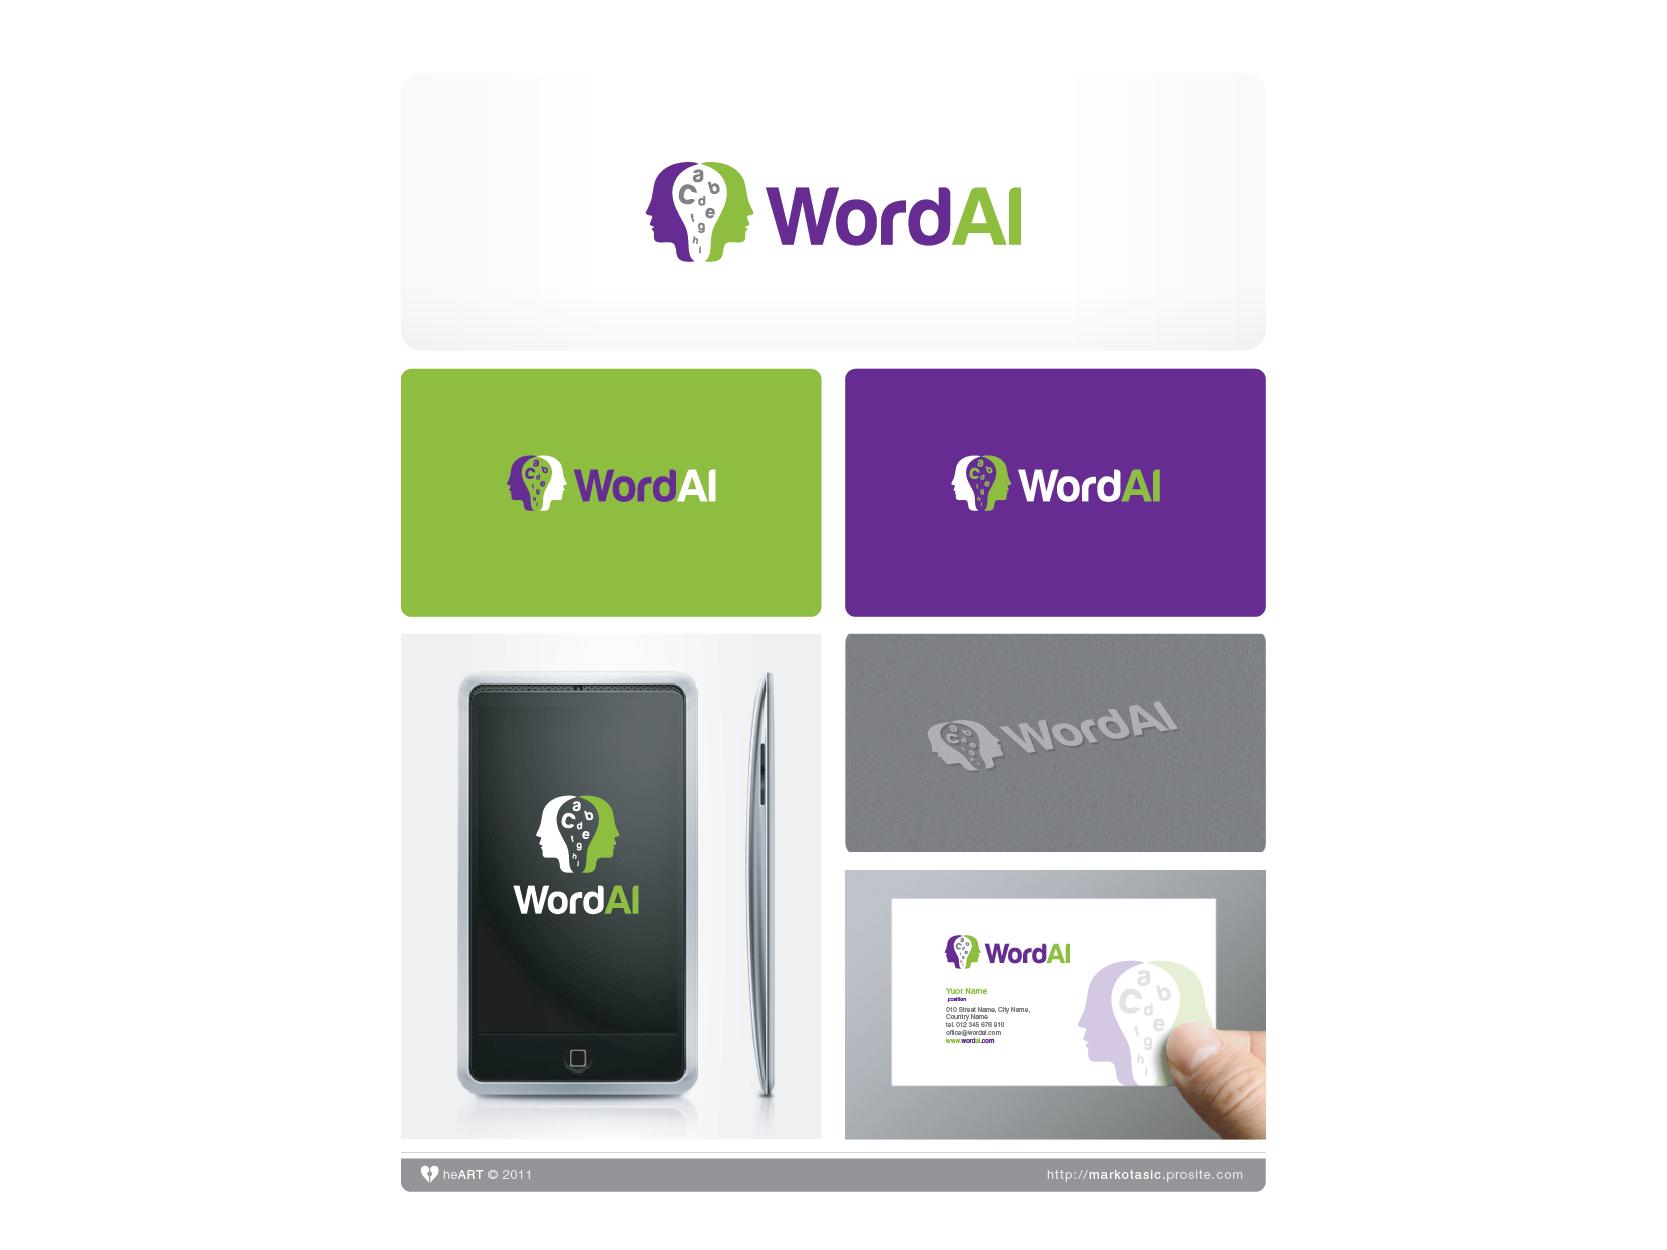 WordAI Needs a Logo (artificial intelligence company)